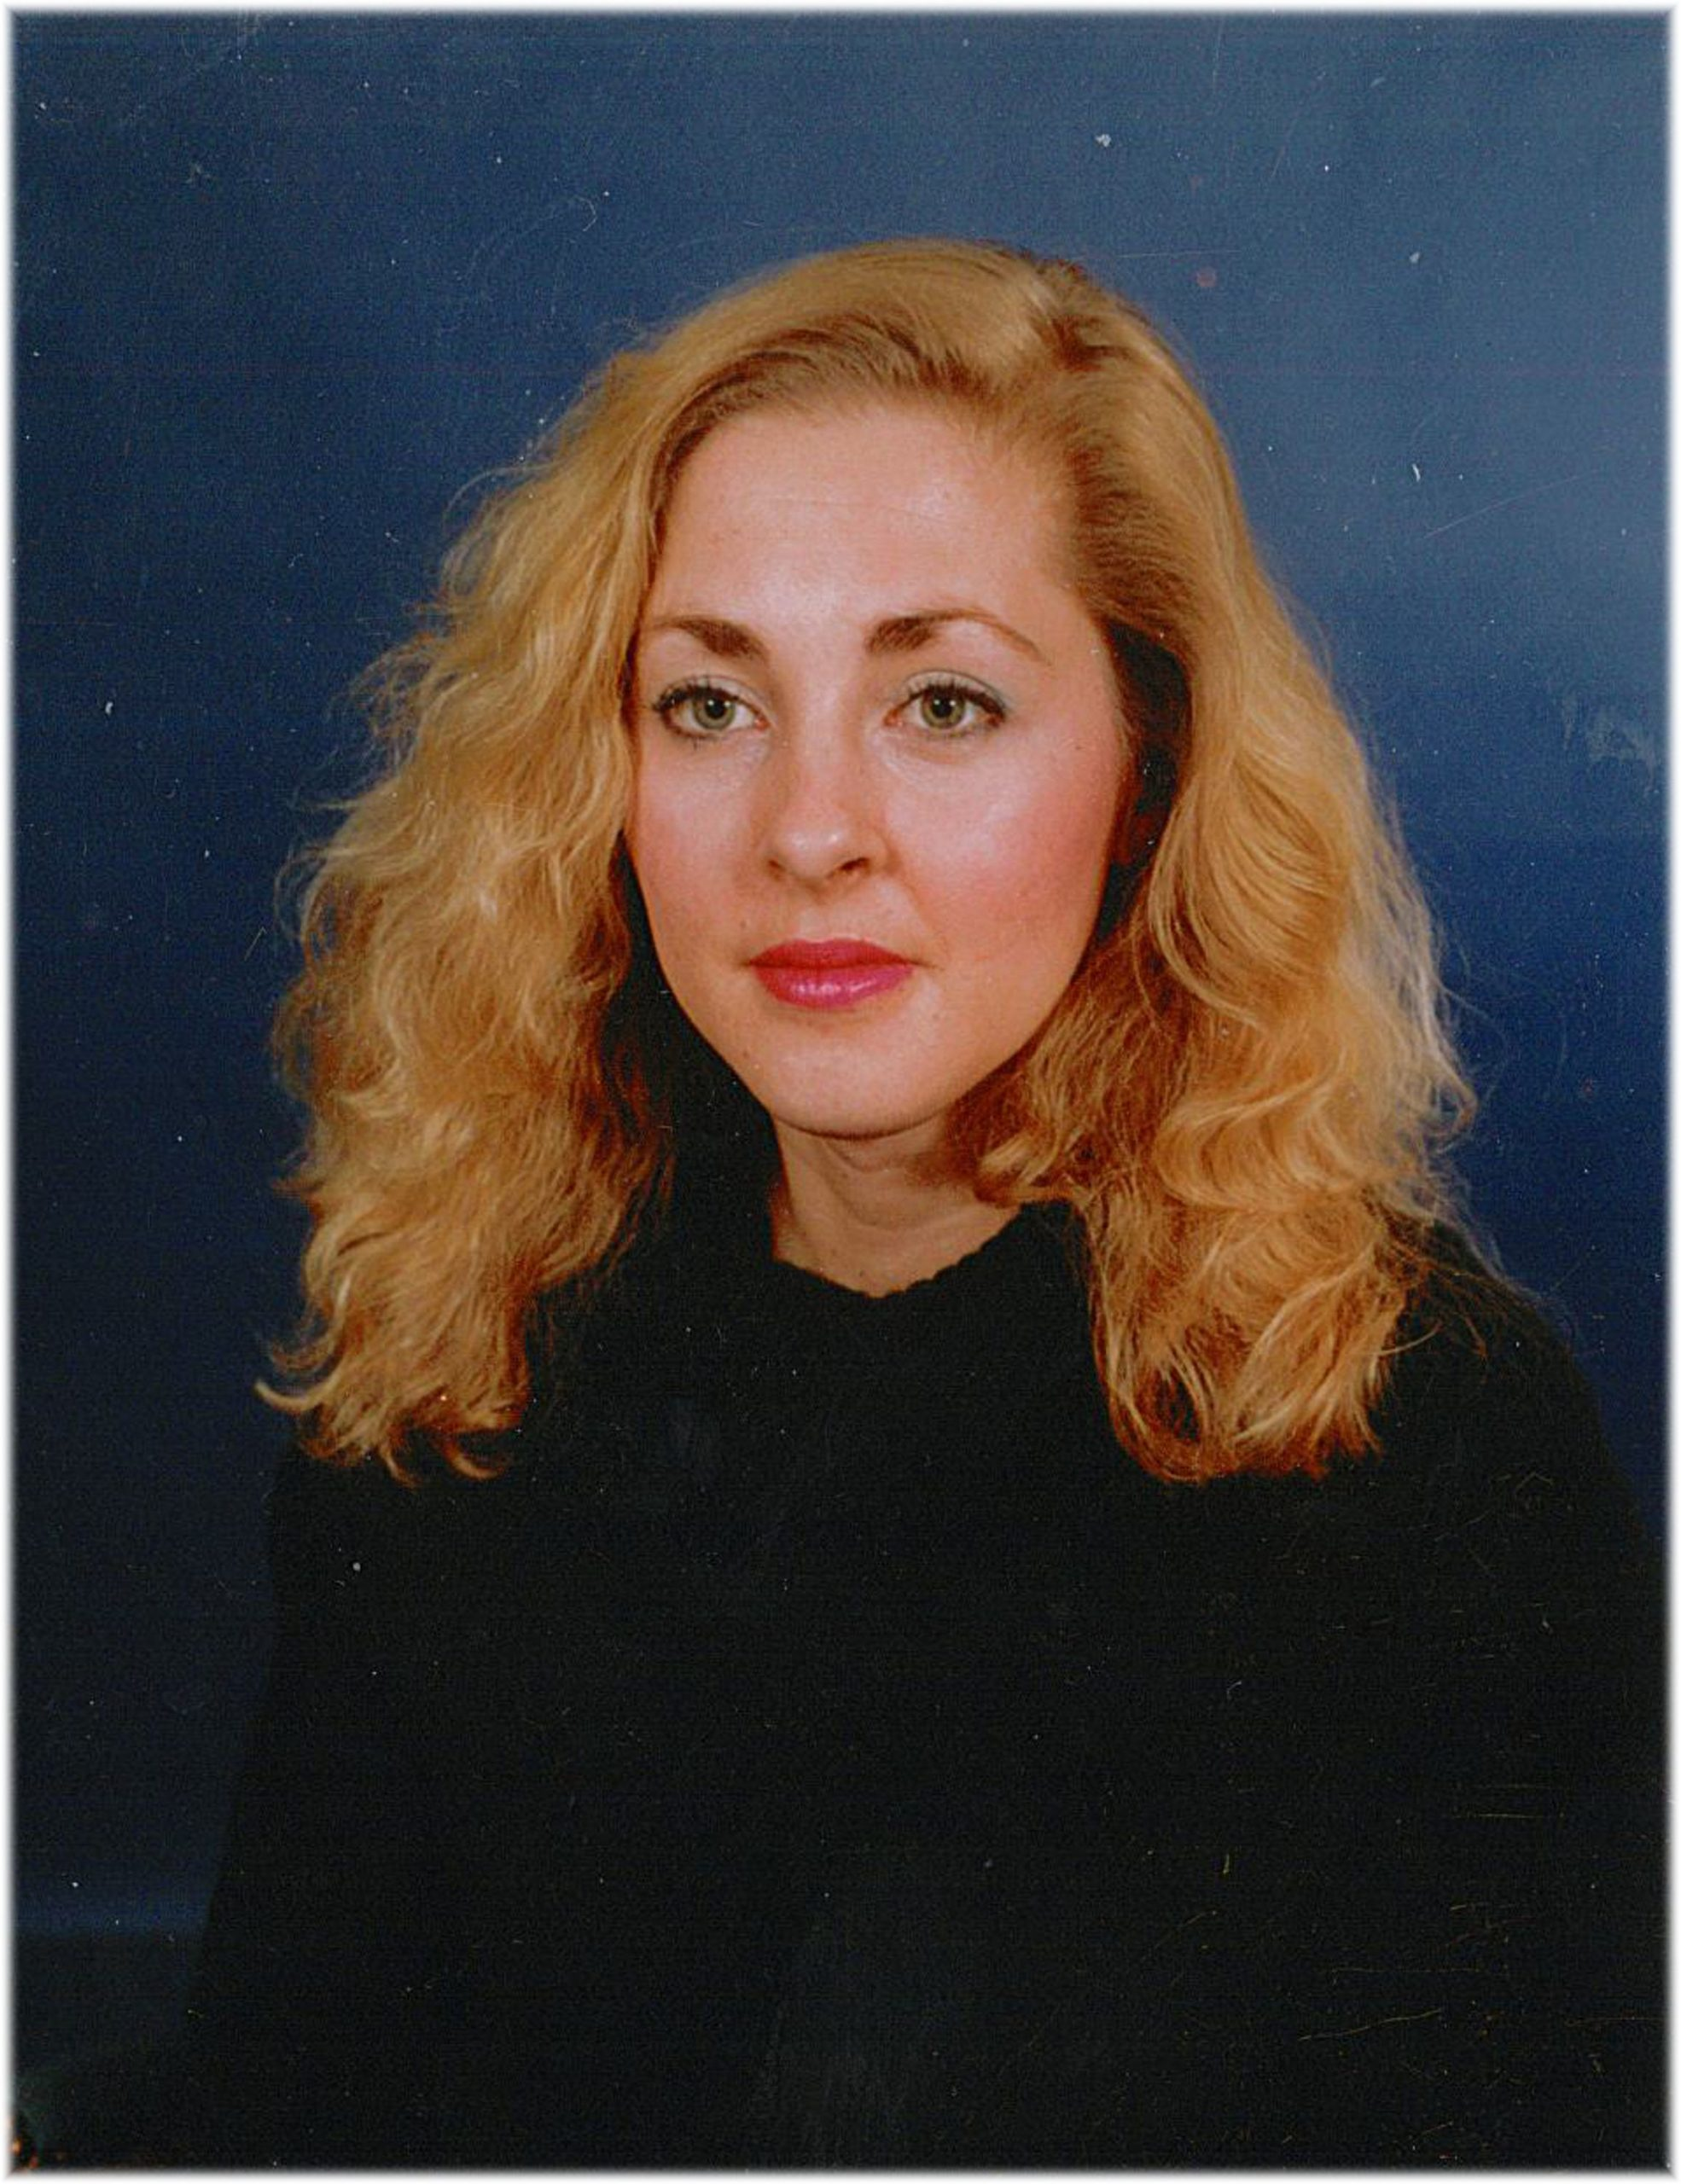 Christine C. Wiley